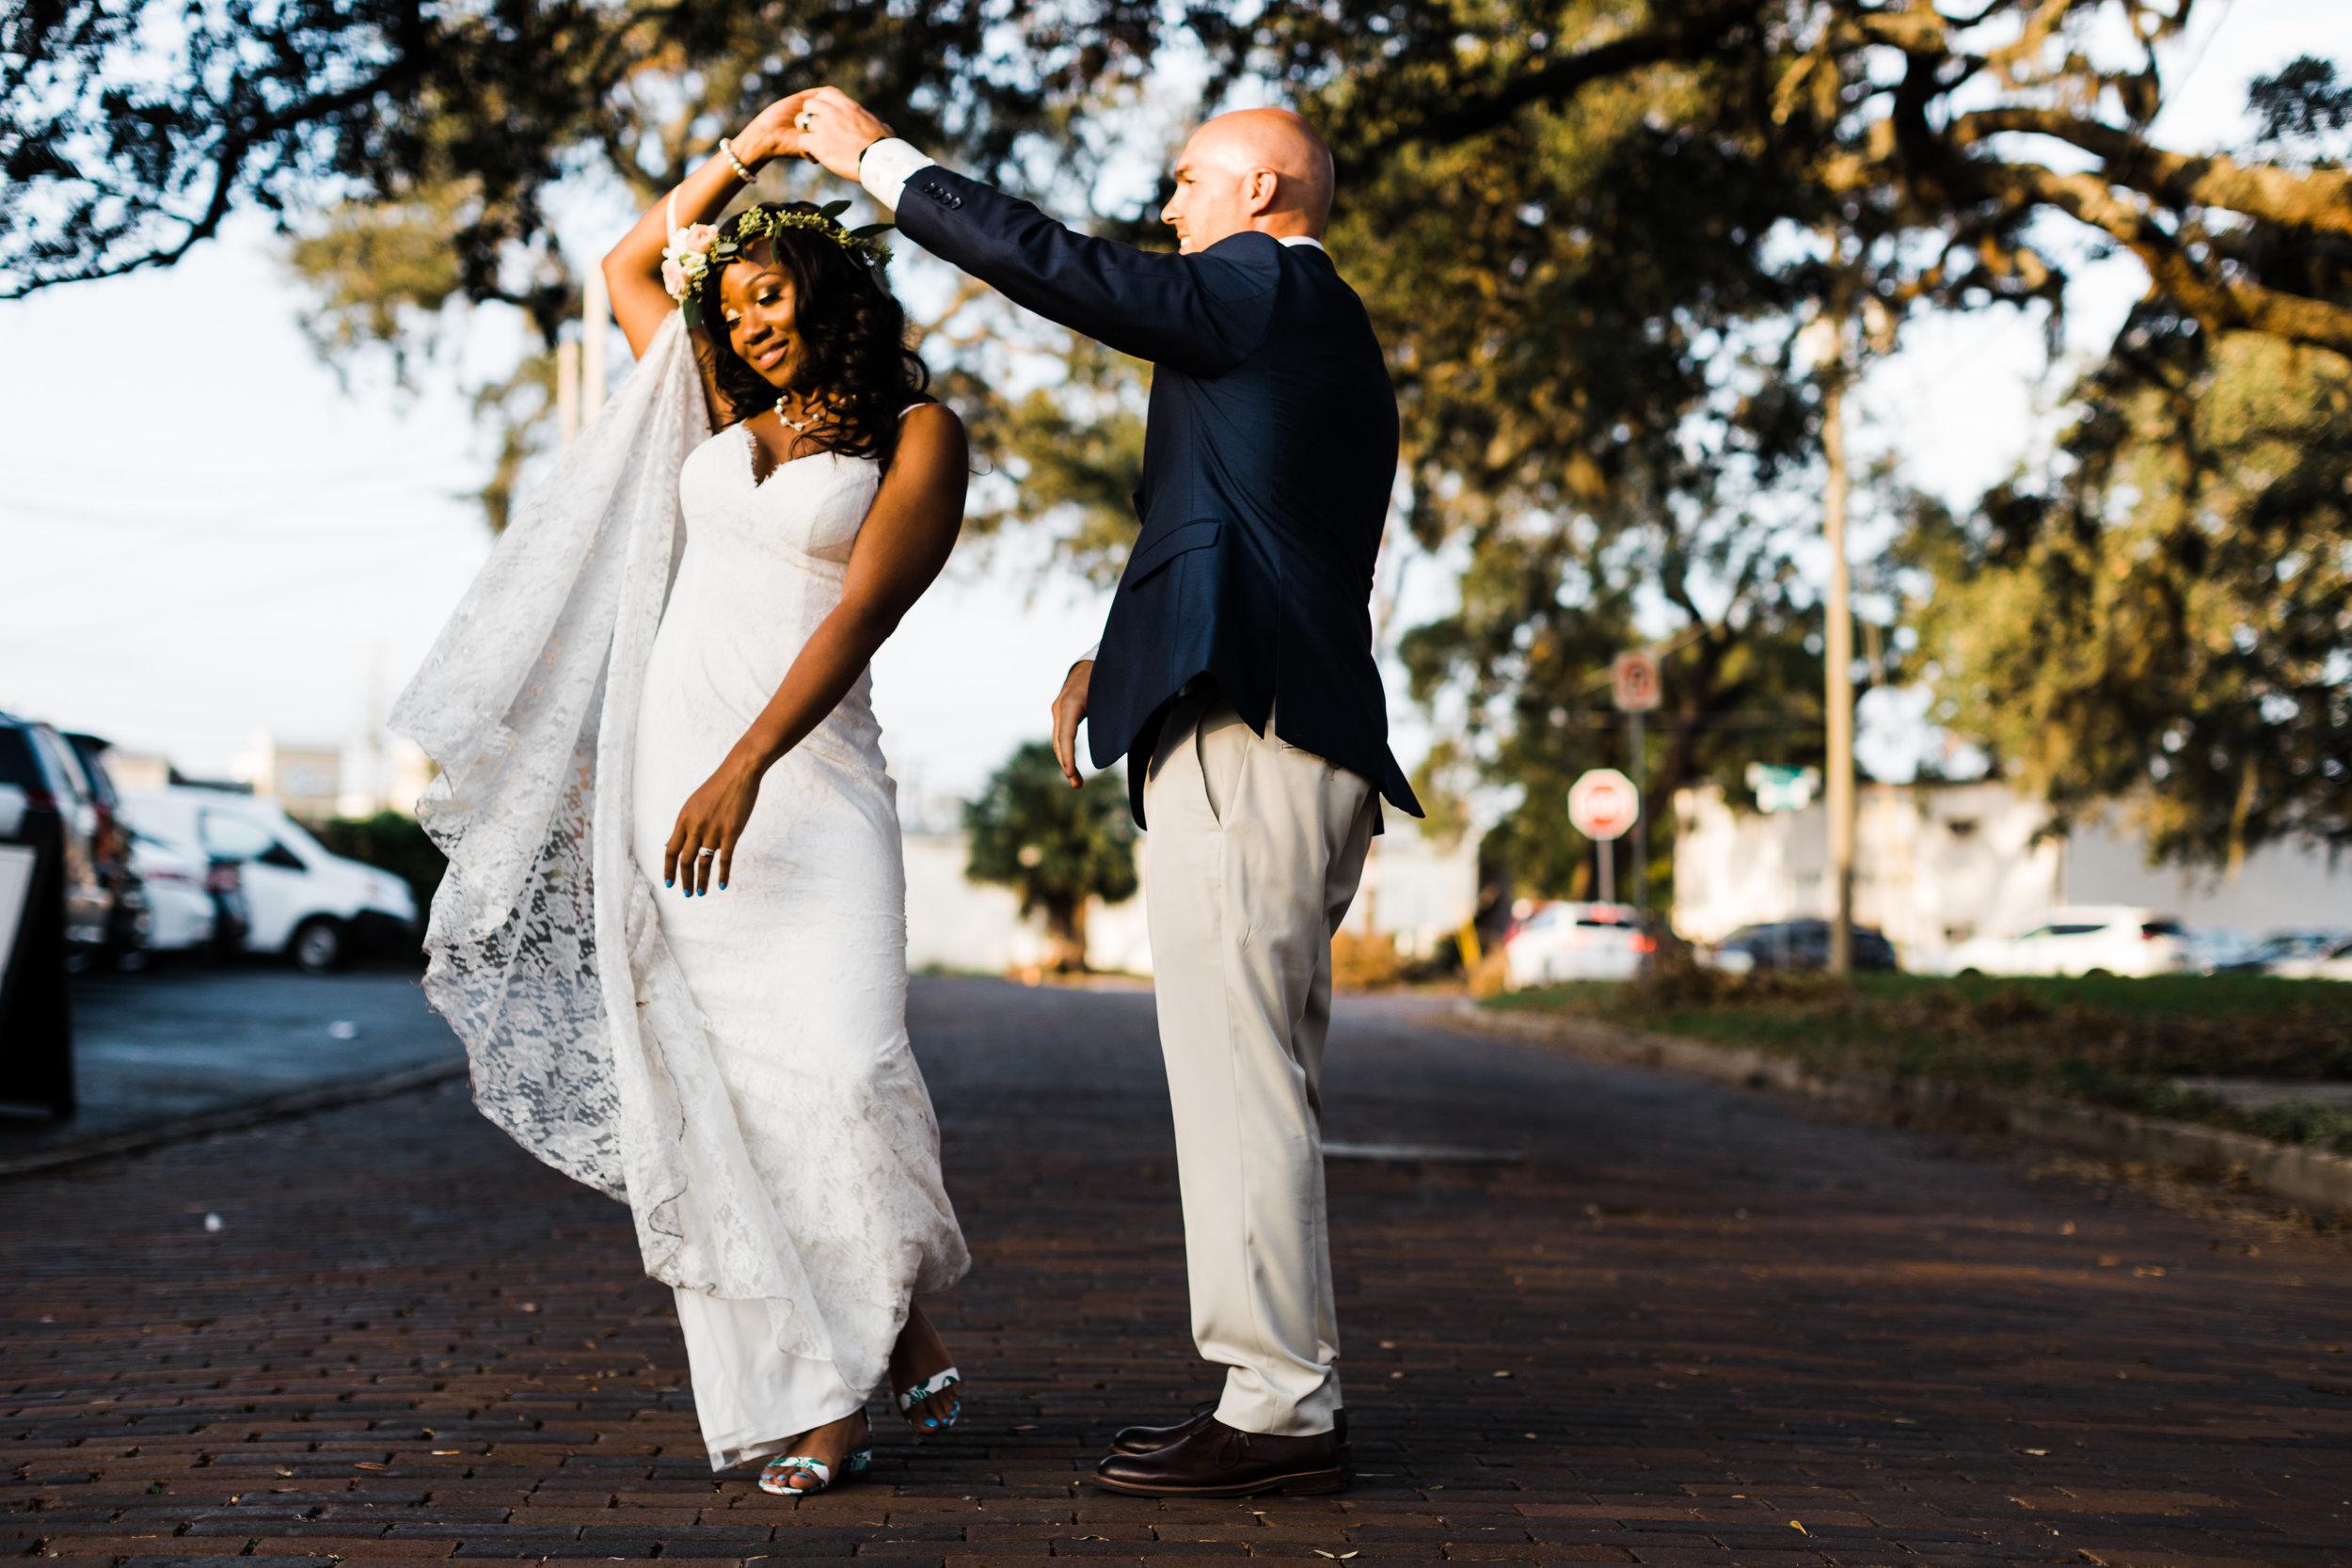 2017.09.16 Ashley and Chuck O'Day Quantam Leap Winery Wedding (421 of 462).jpg